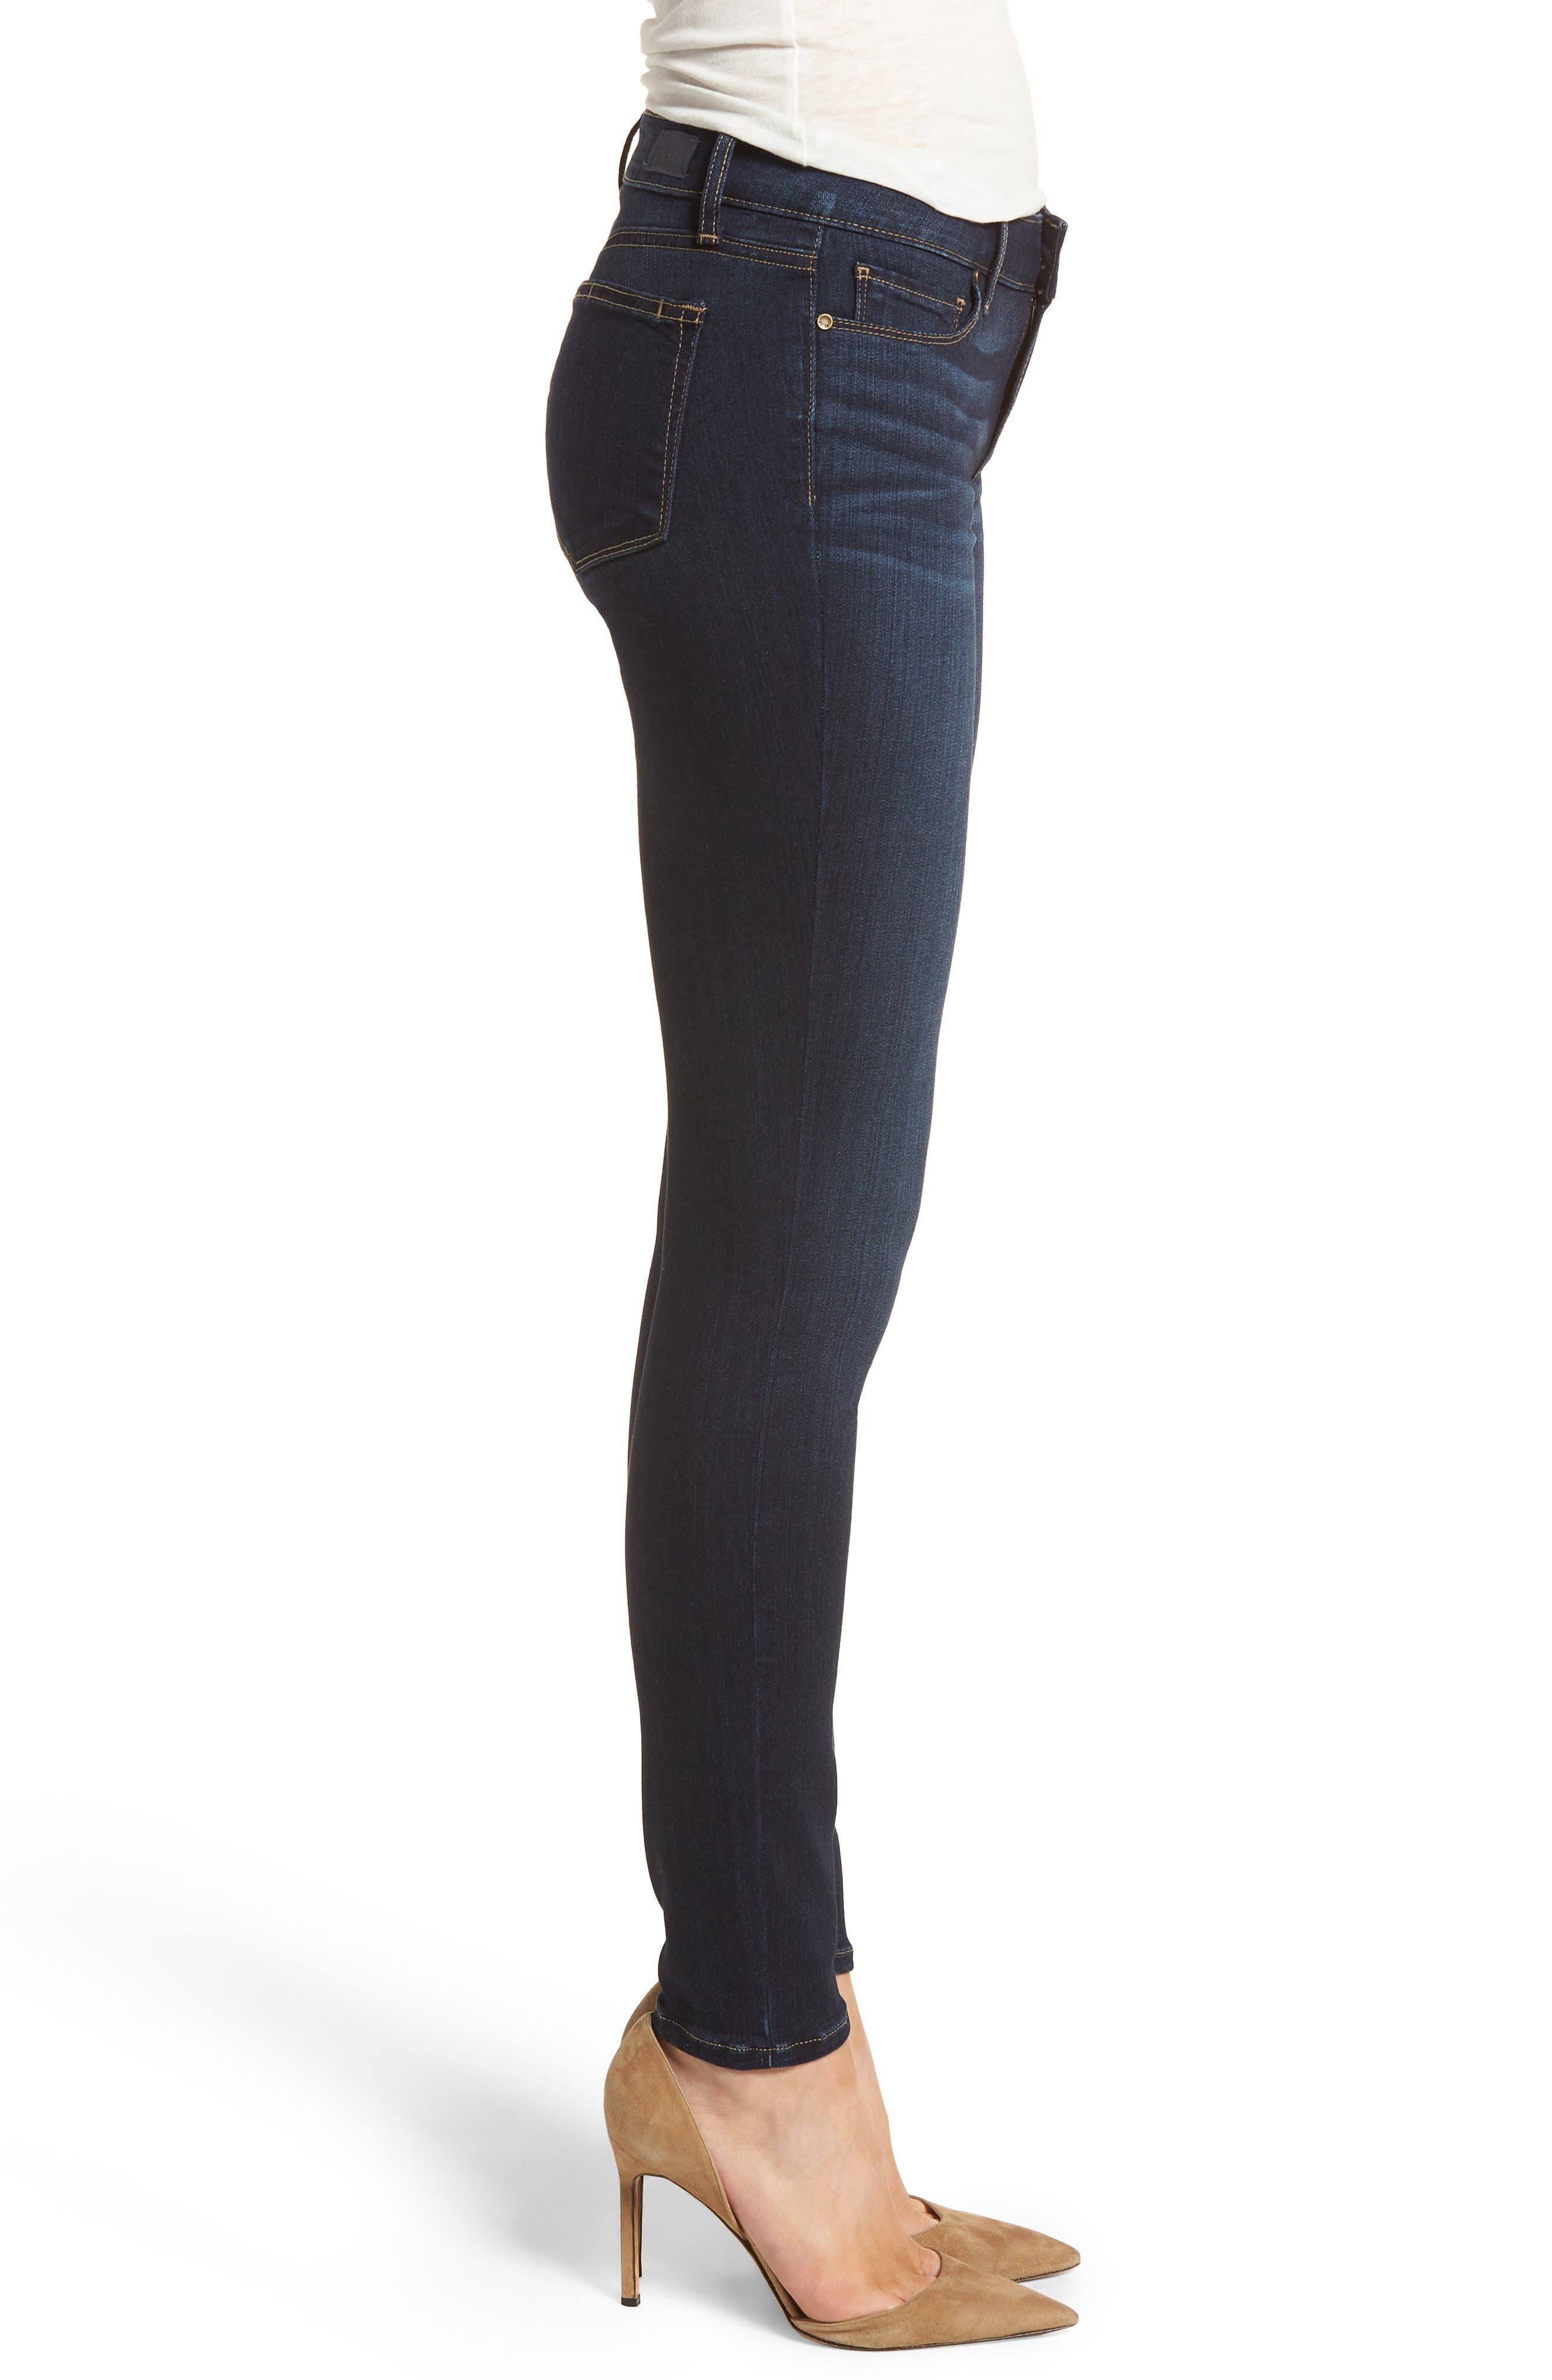 Transcend - Verdugo Ultra Skinny Jeans,                             Alternate thumbnail 3, color,                             Koda